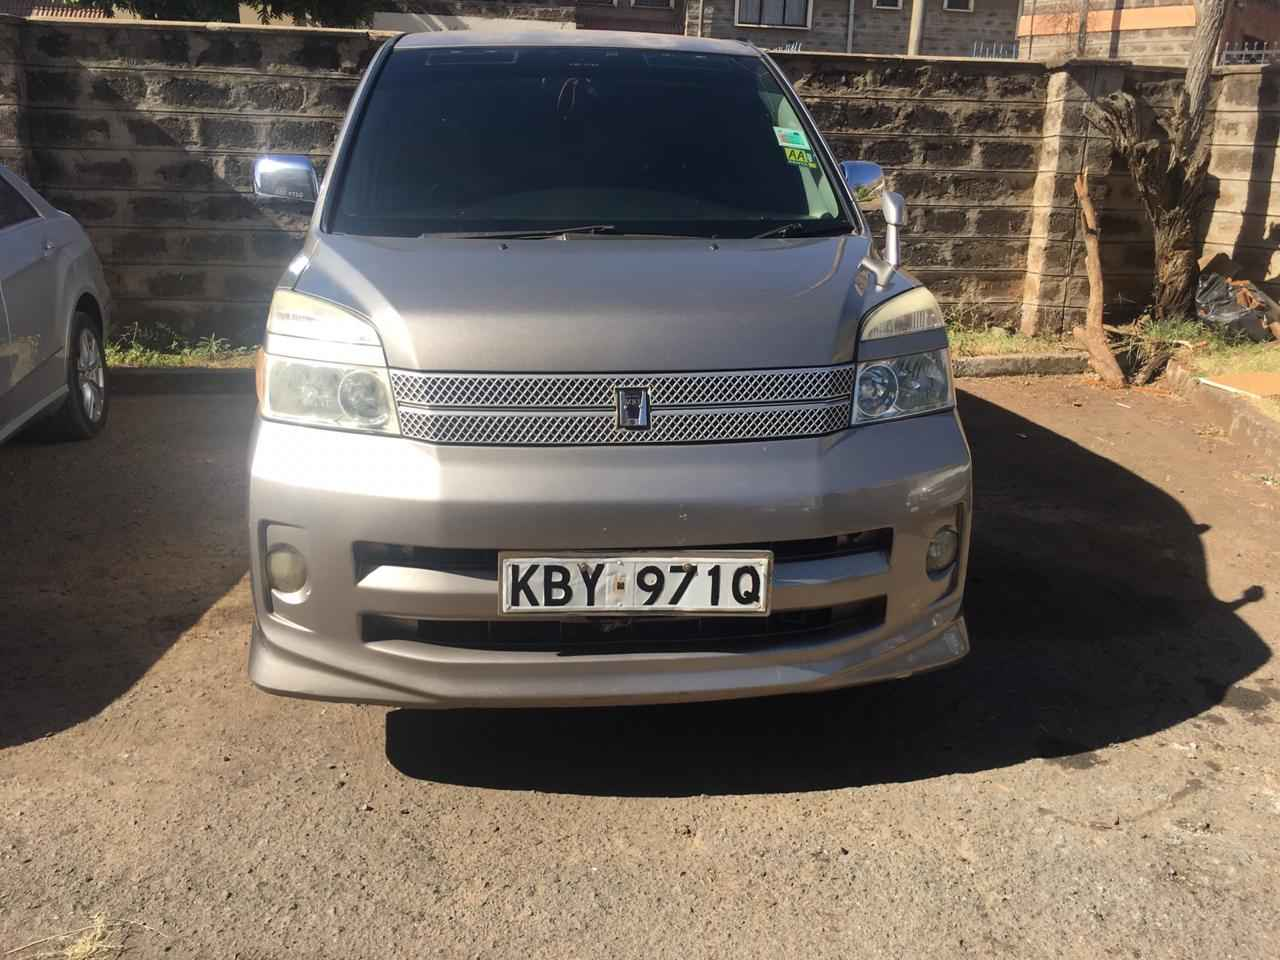 Advantages of hiring a vehicle (Toyota voxy hire Kenya)